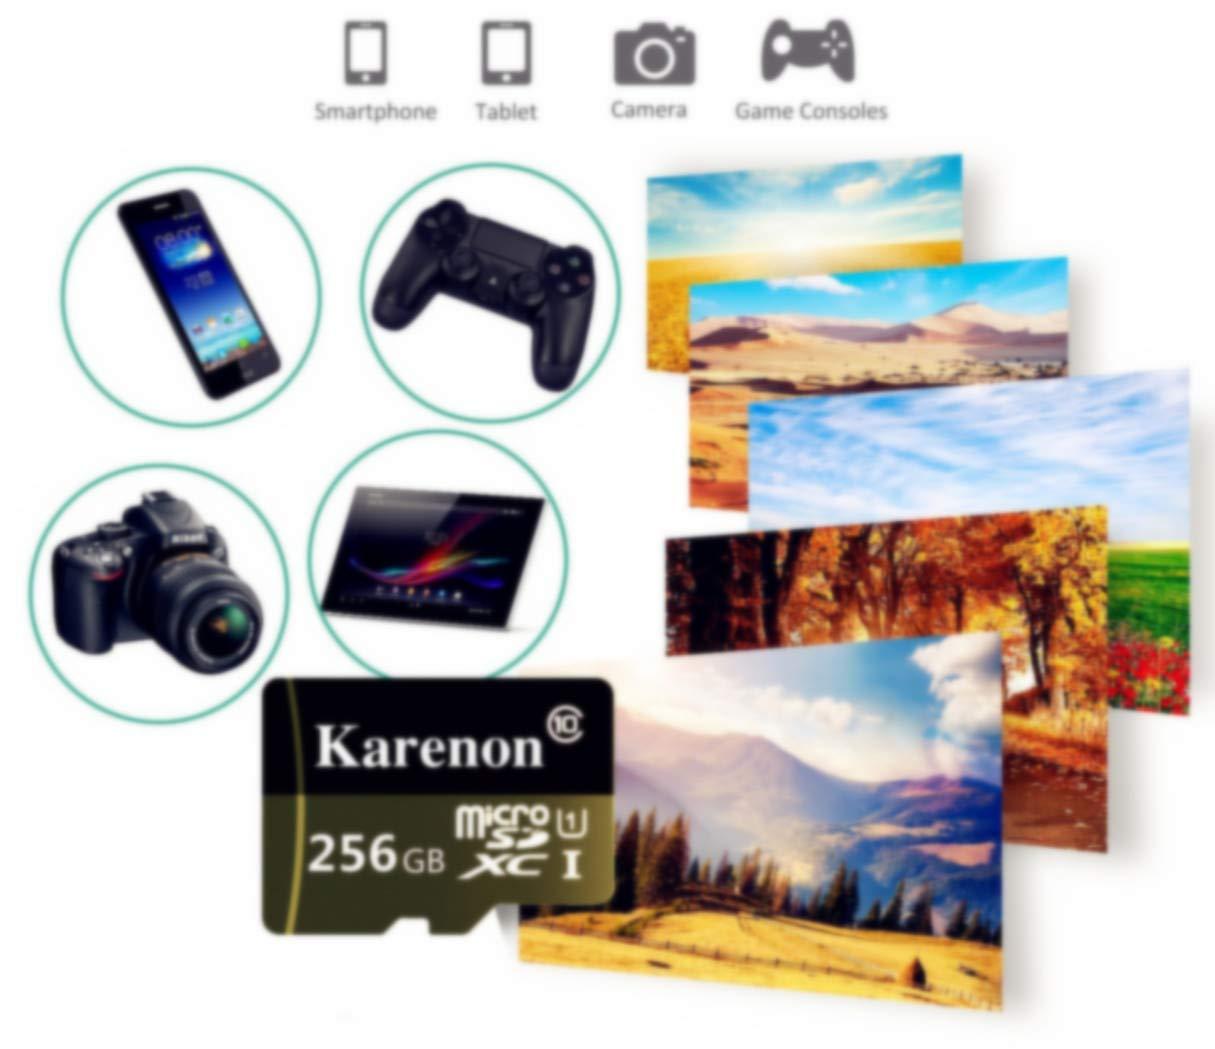 Karenon Tarjeta Micro SD 256 GB, microSDXC 256 GB Class 10 Tarjeta de Memoria + Adaptador (DY135-RS) (256GB)